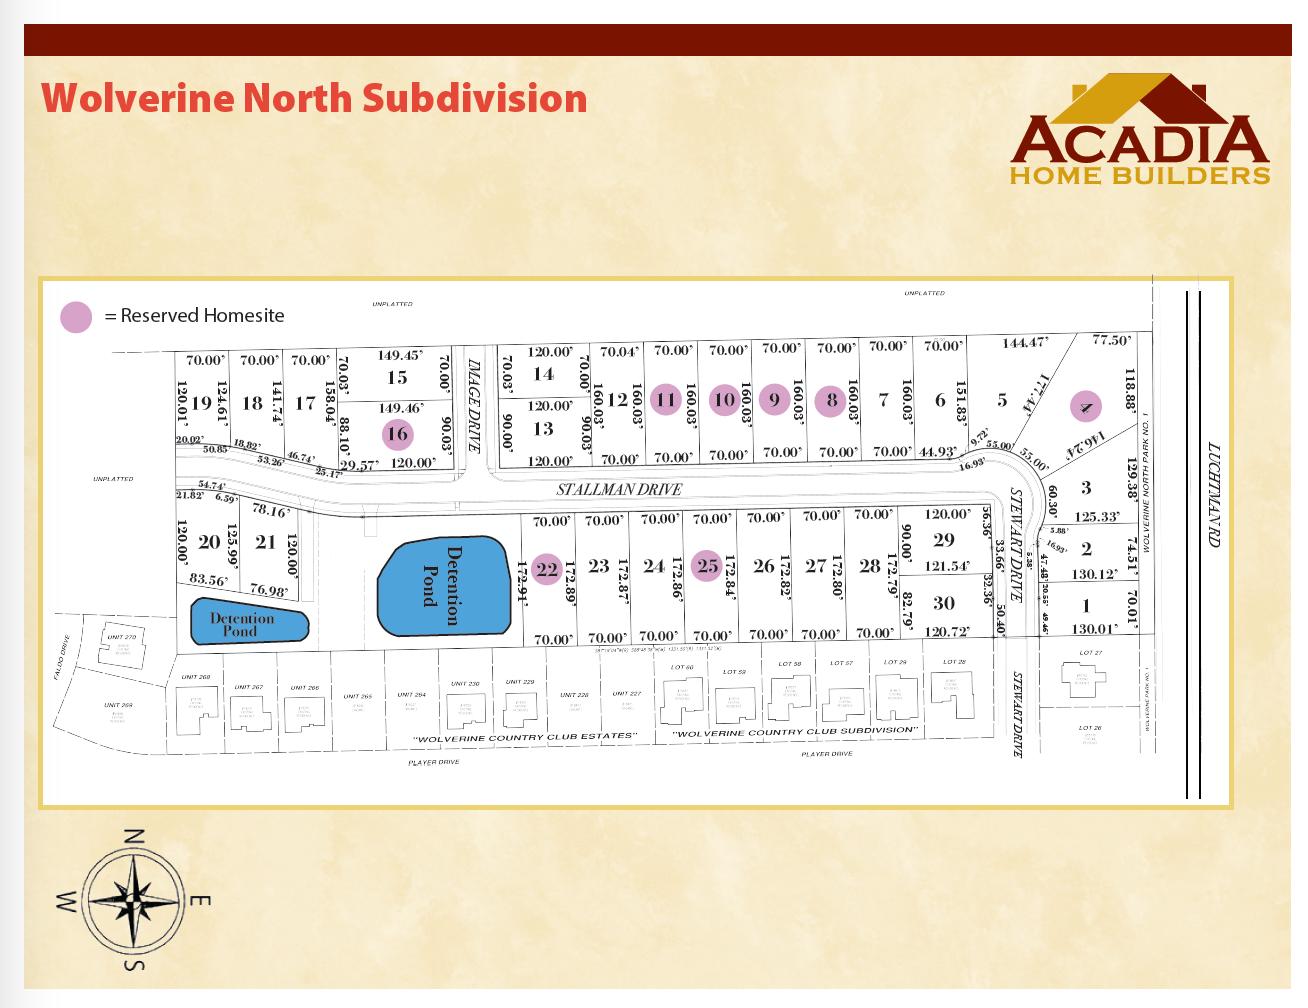 Wolverine North Site Map